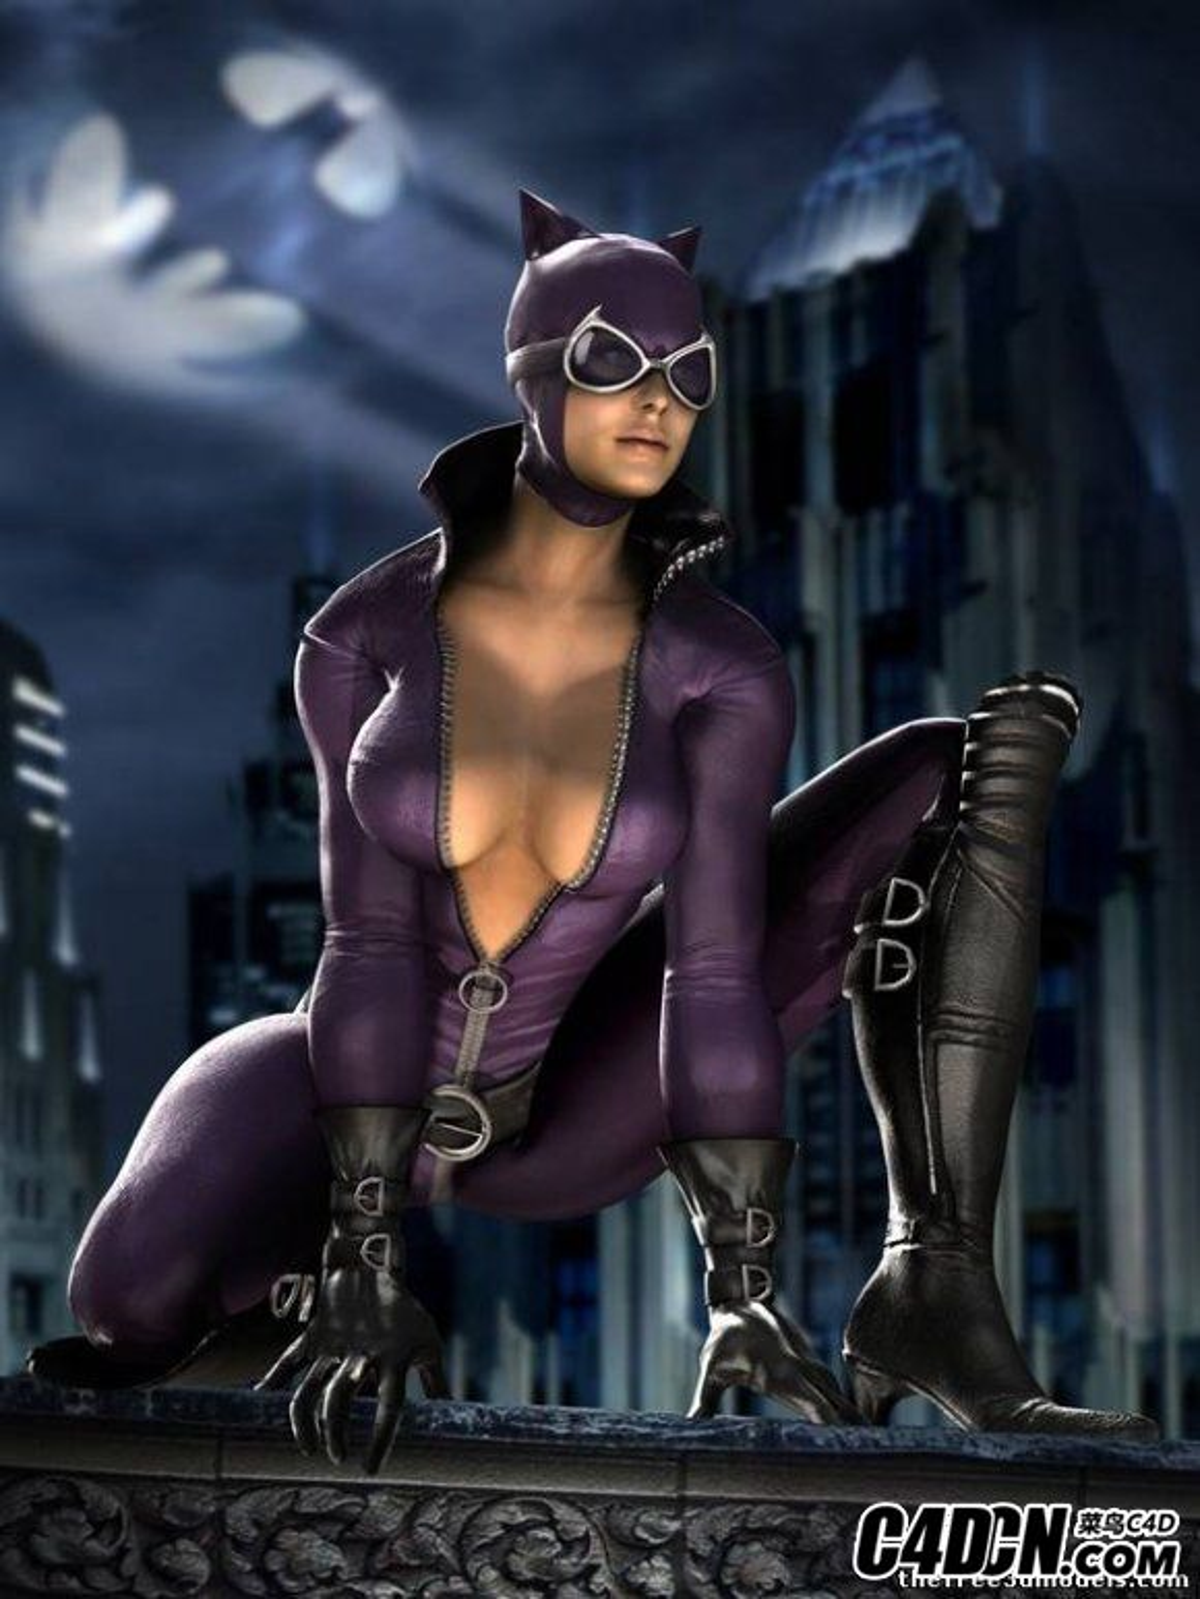 l70135-catwoman-26394.jpg